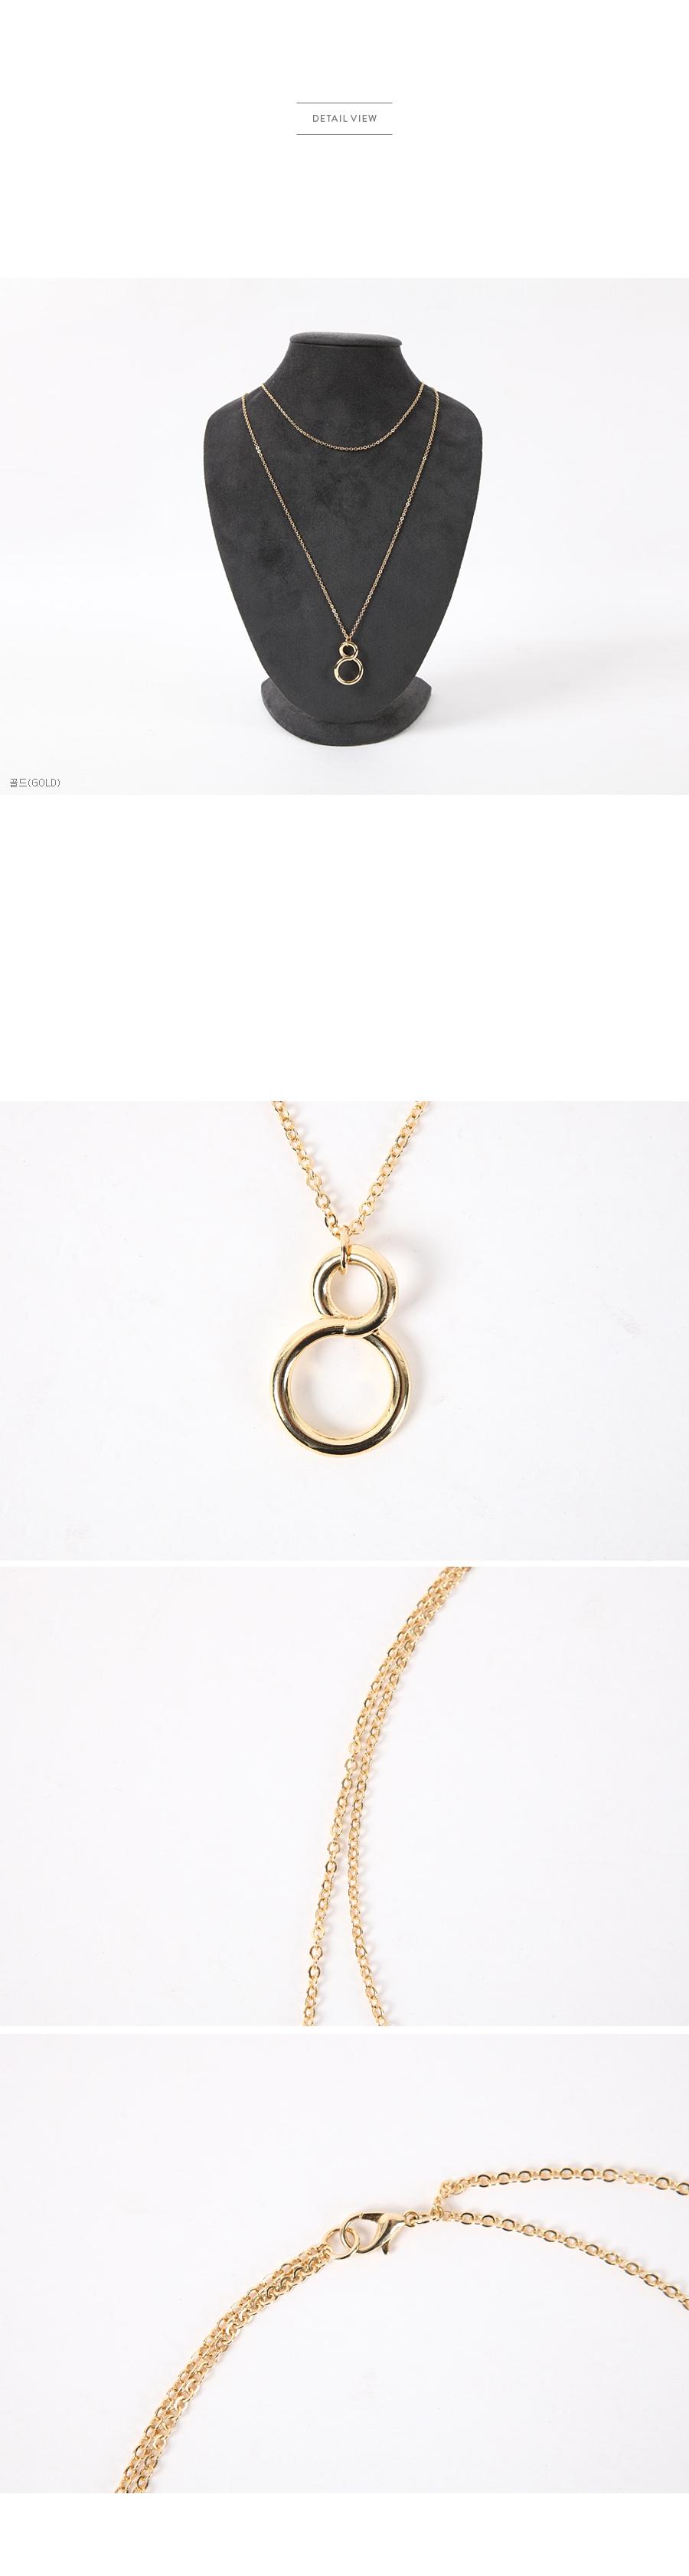 ribbontie-韩国时尚的8字形的圆形装饰吊坠女装2016年